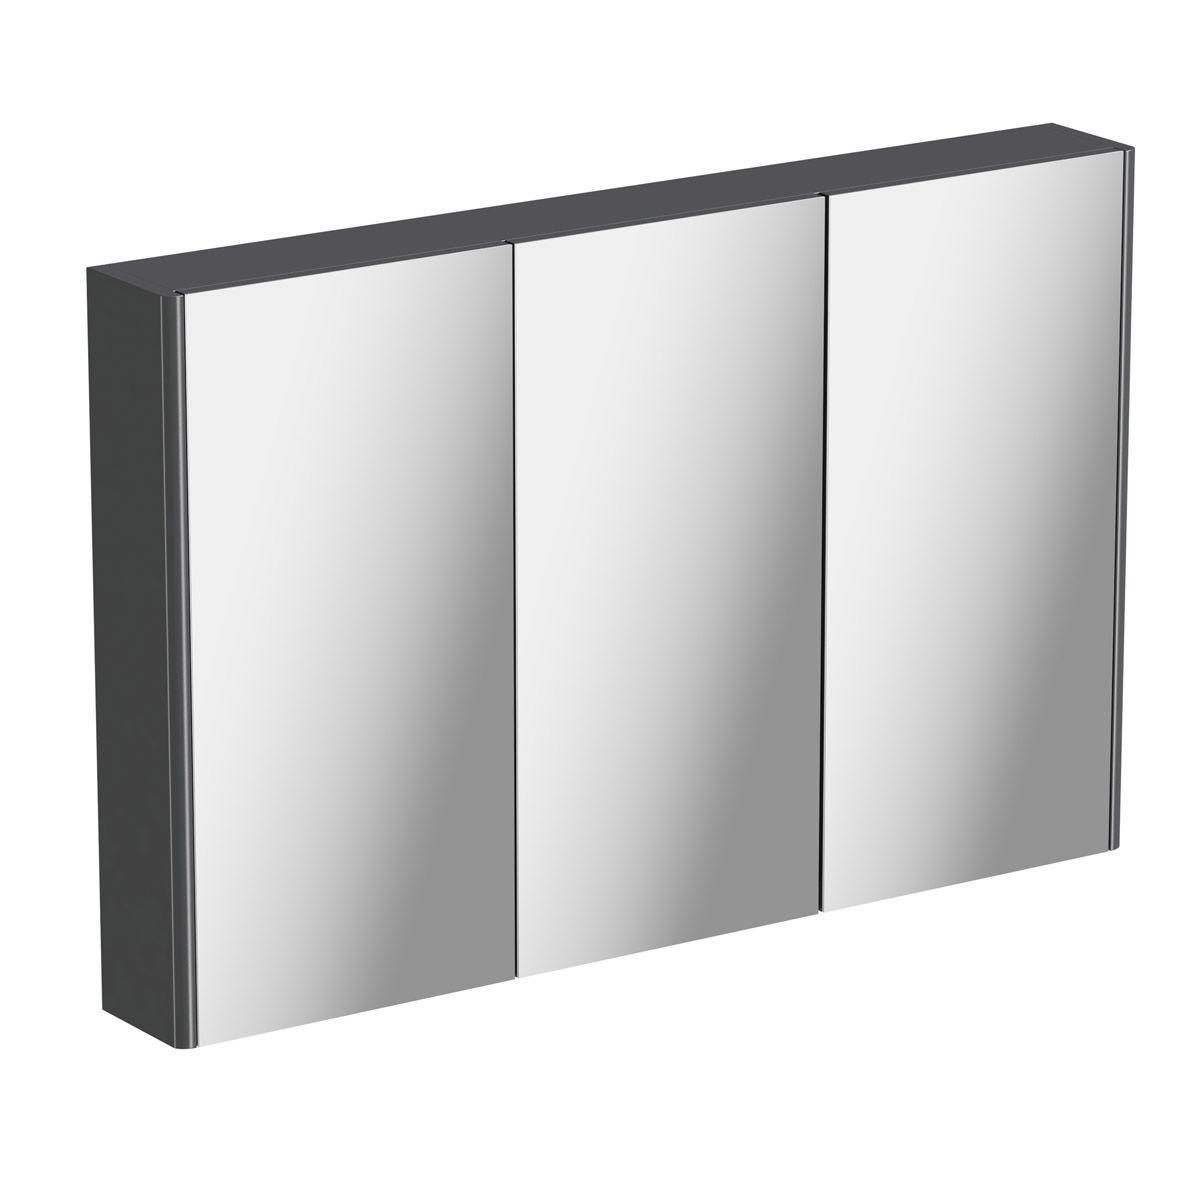 Mode Slate Gloss Grey Mirror Cabinet 650 X 1000mm Mirror Cabinets Gray Mirror Trendy Home